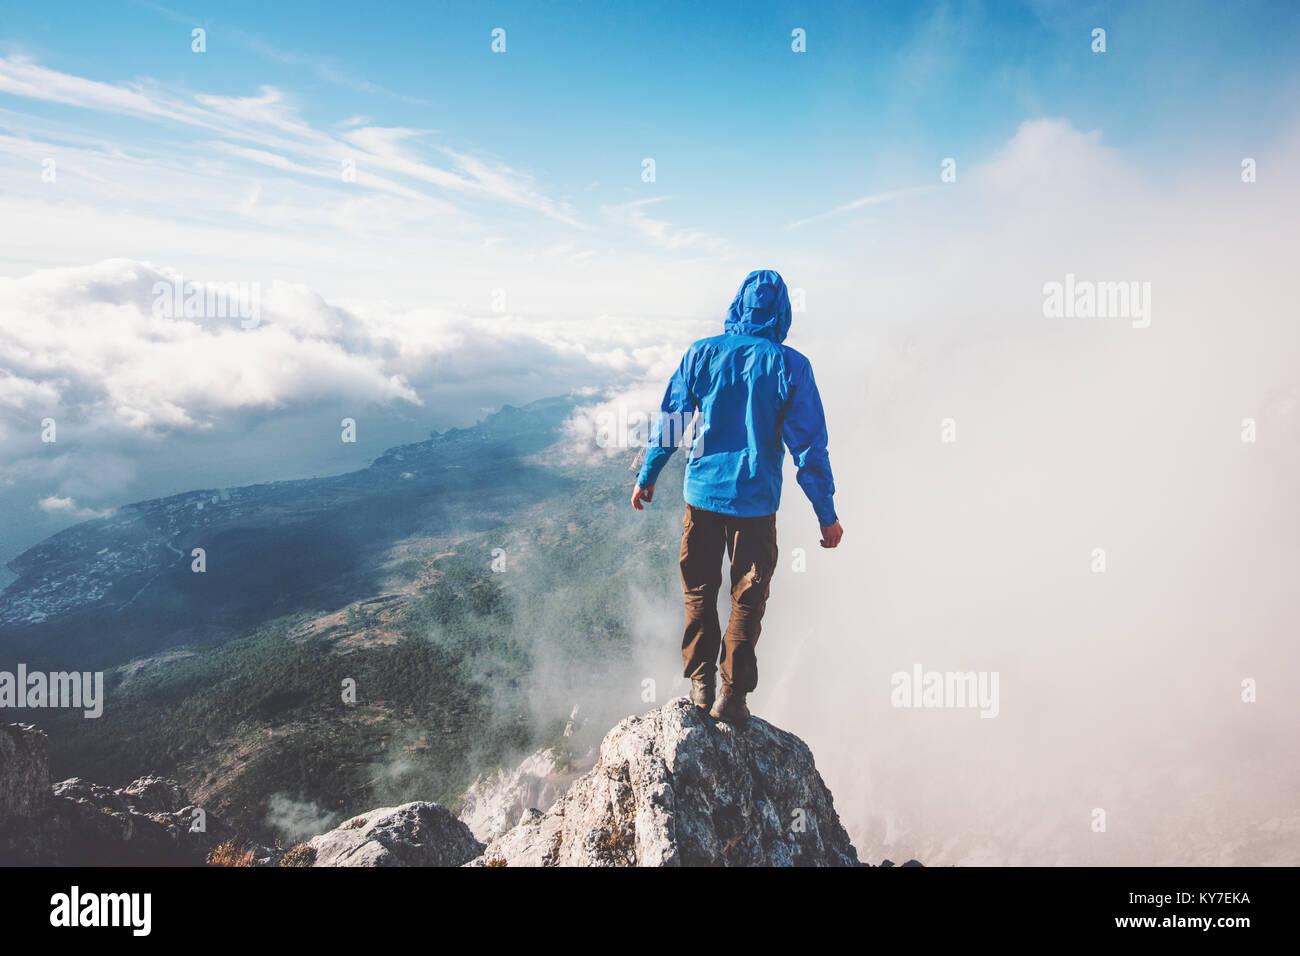 a7105da74 Hombre viajero sobre montaña acantilado disfrutando vistas aéreas nubes  viajan Lifestyle éxito concepto Imagen De Stock